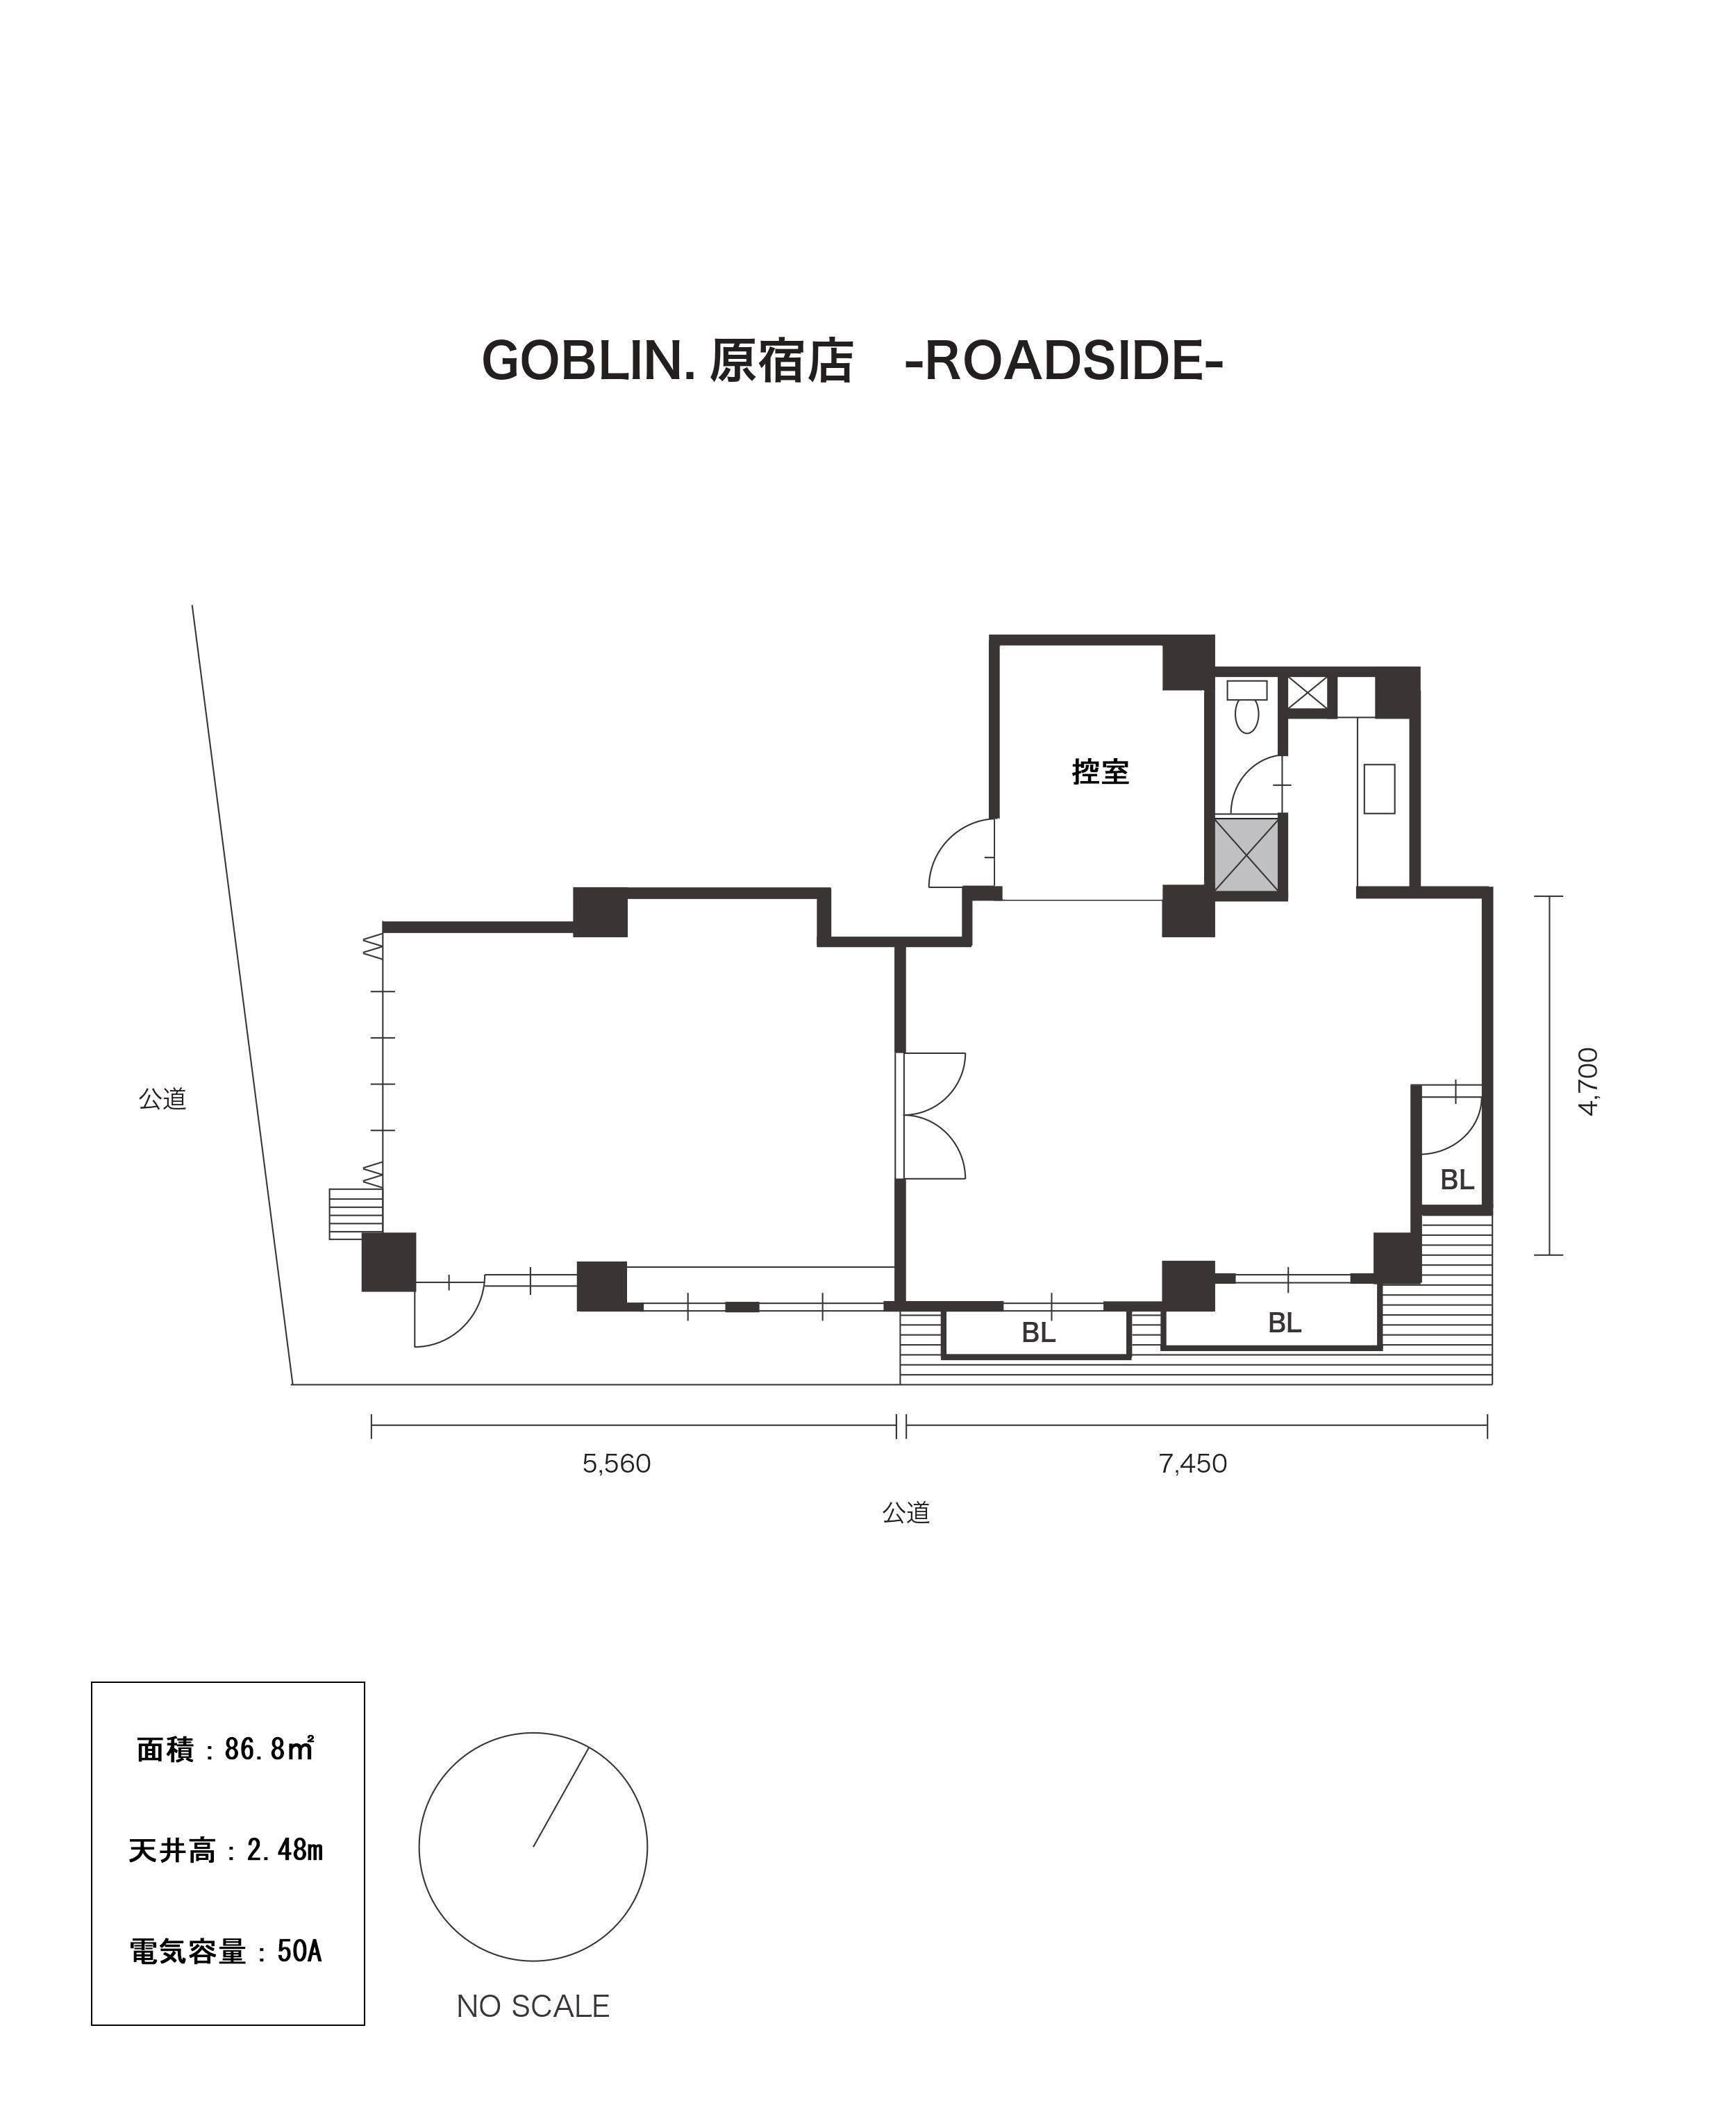 GOBLIN.原宿店 -ROADSIDE-平面図